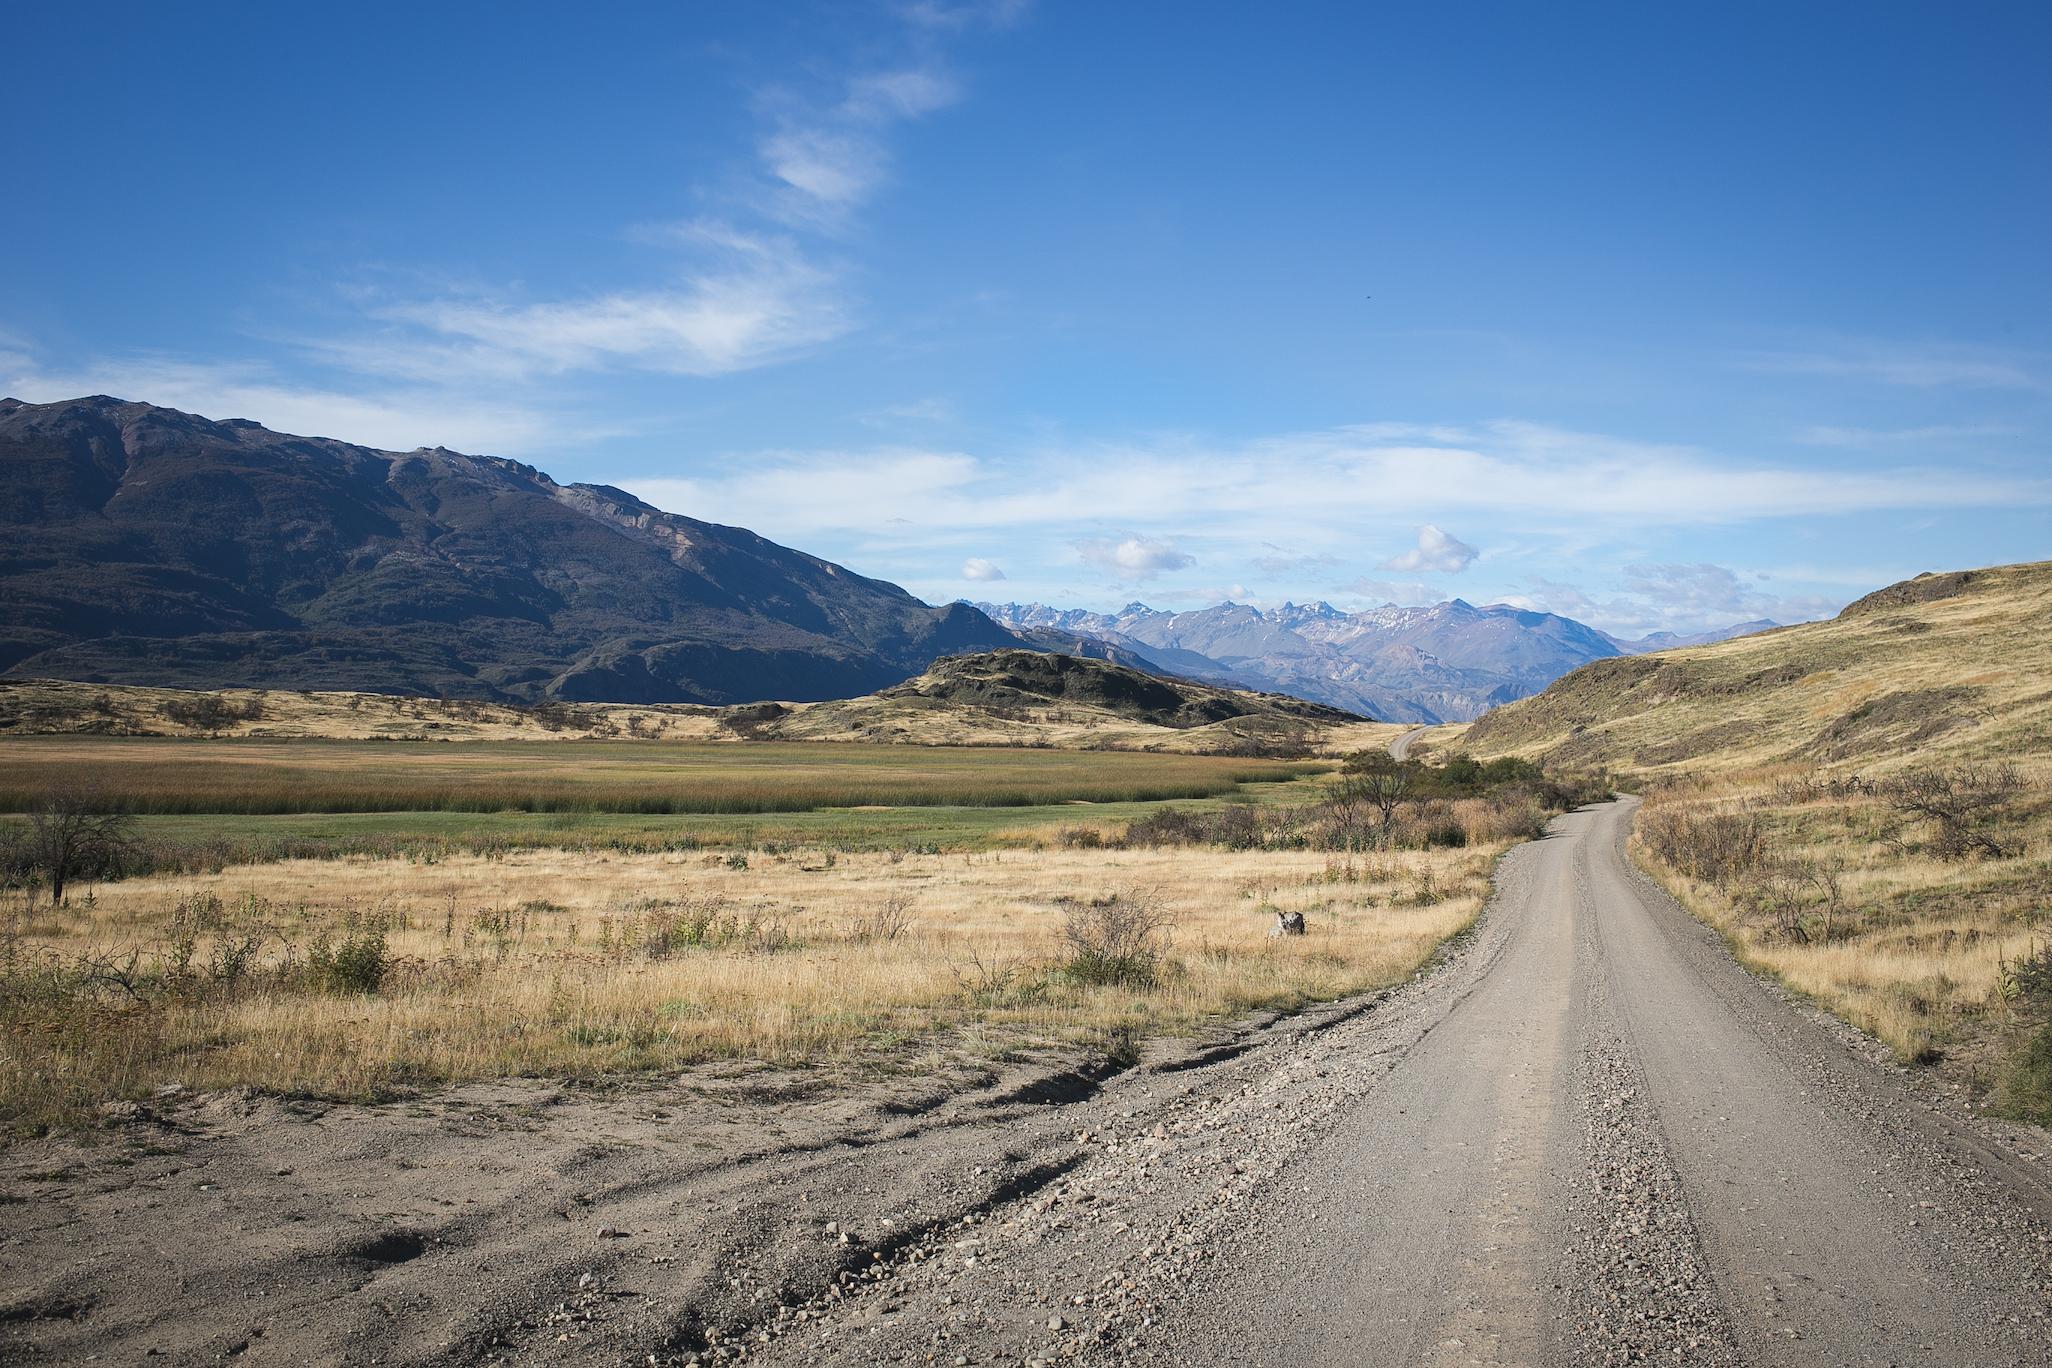 Patagonia2015-6.jpg